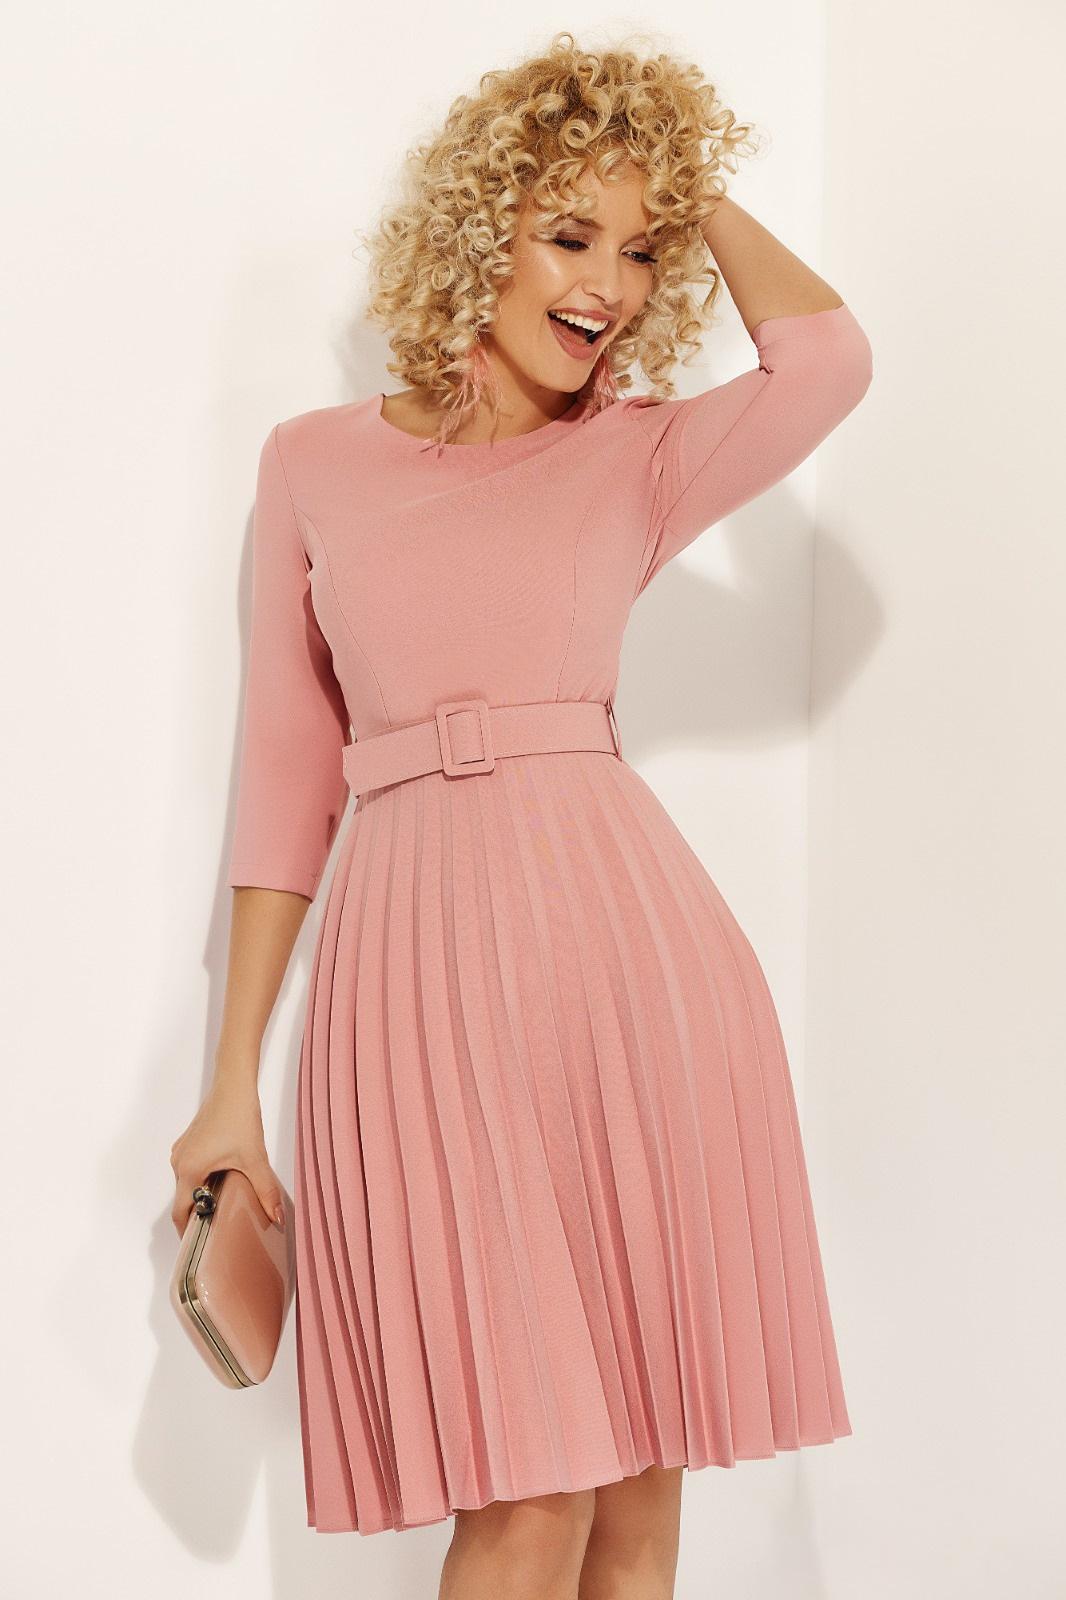 Fofy rosa elegant folded up cloche dress accessorized with tied waistband slightly elastic fabric